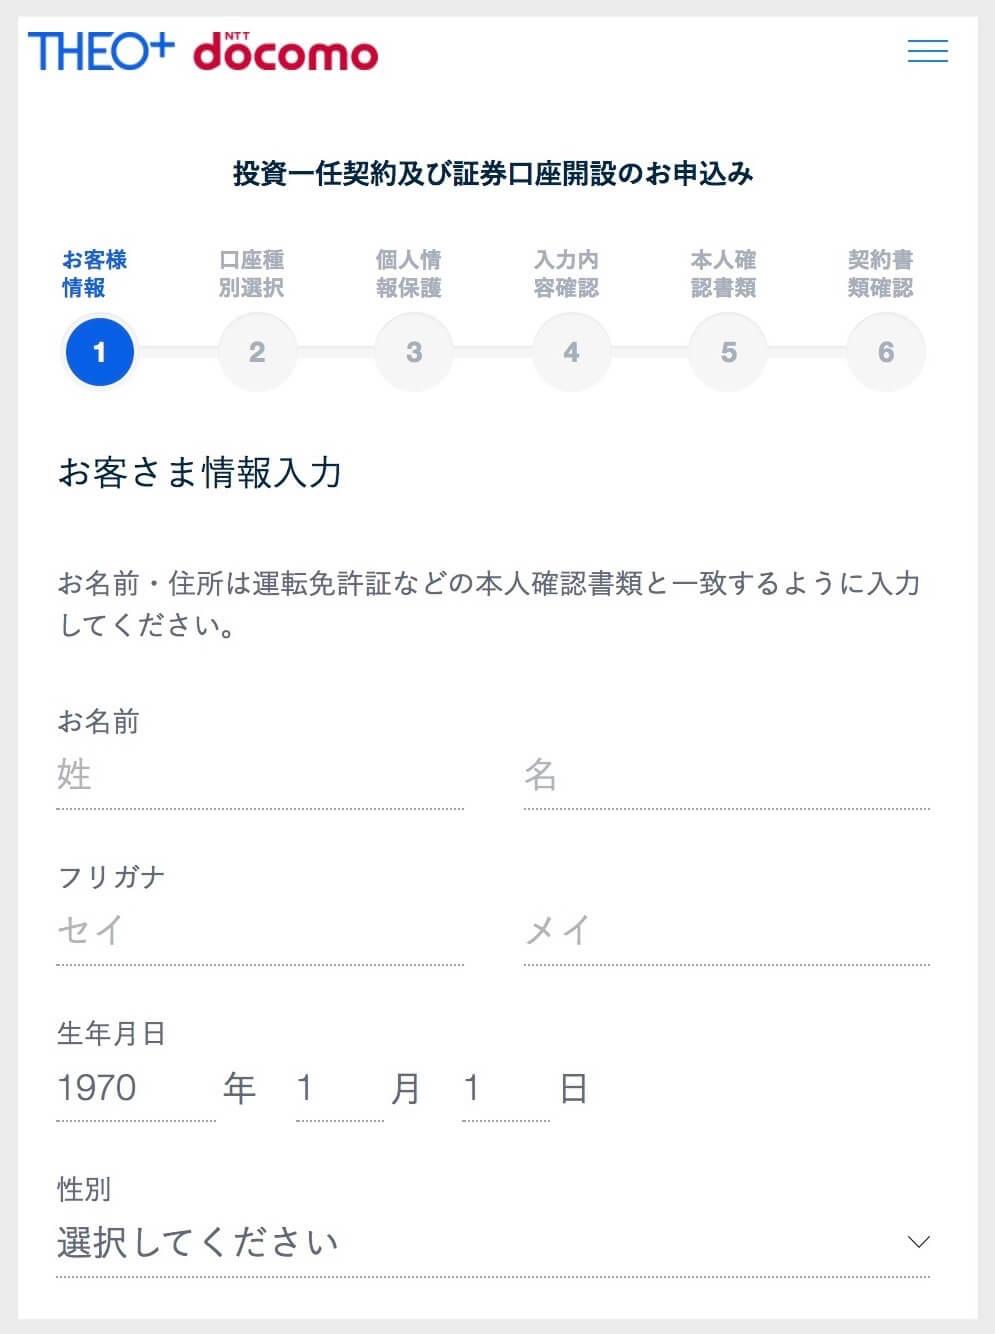 THEO+docomo_ お客様情報登録